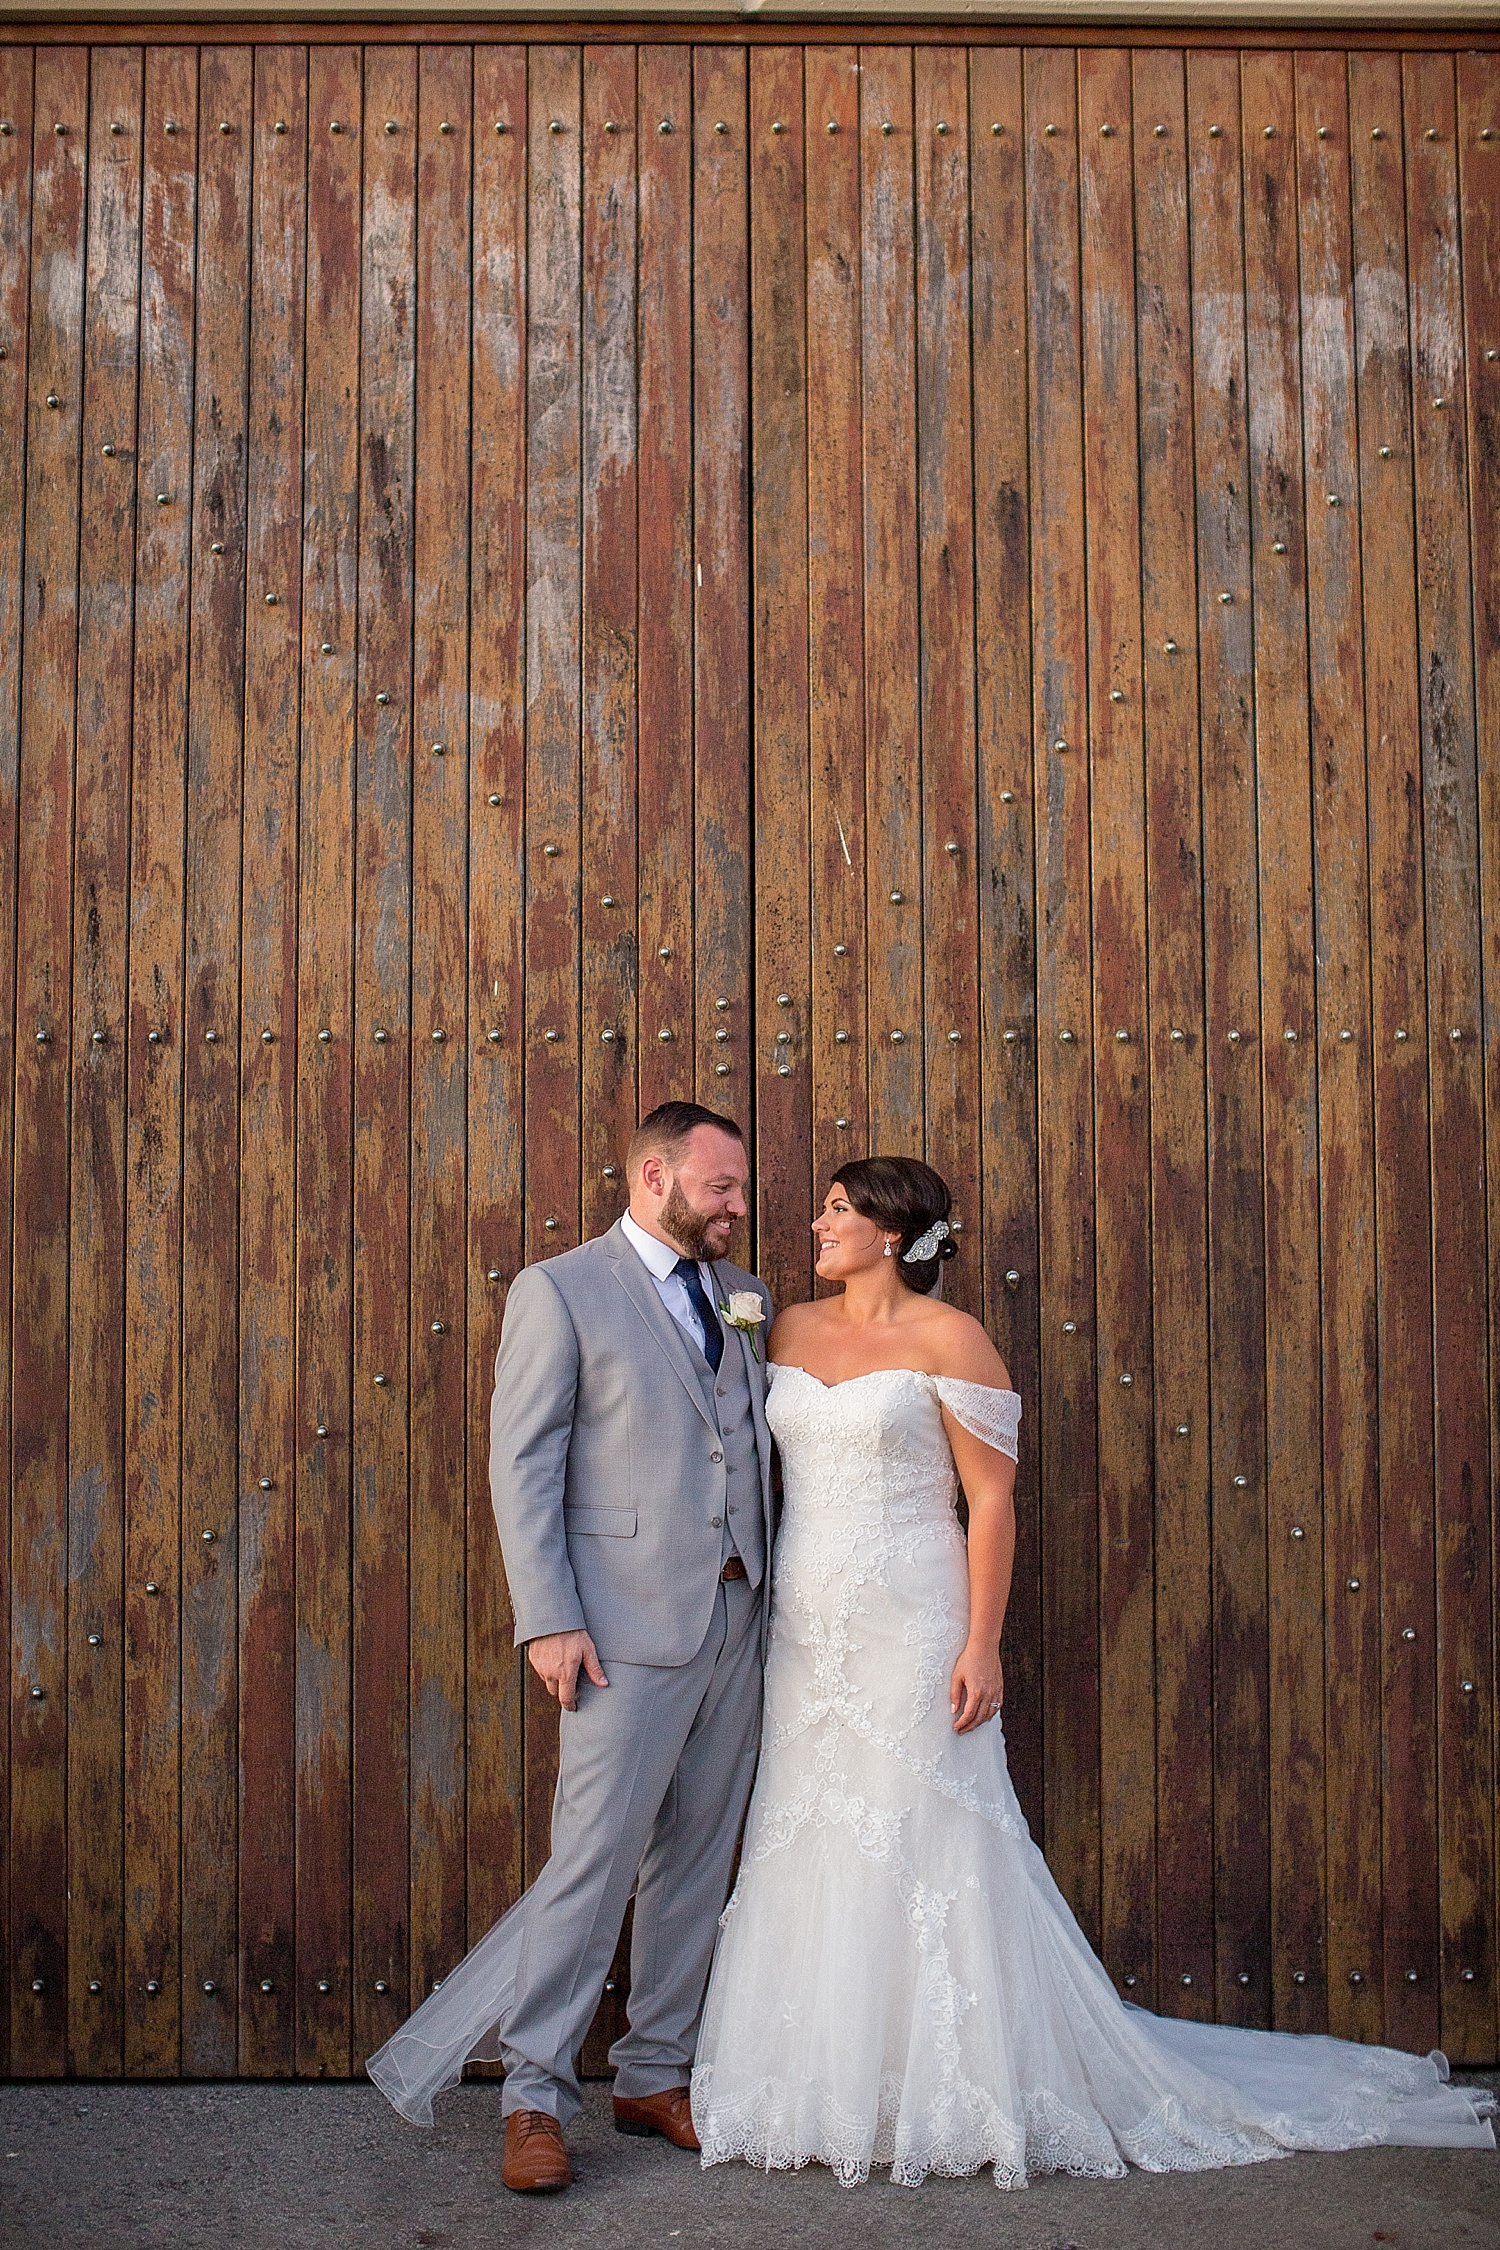 Oakover_Grounds_Winery_Wedding_0296.jpg